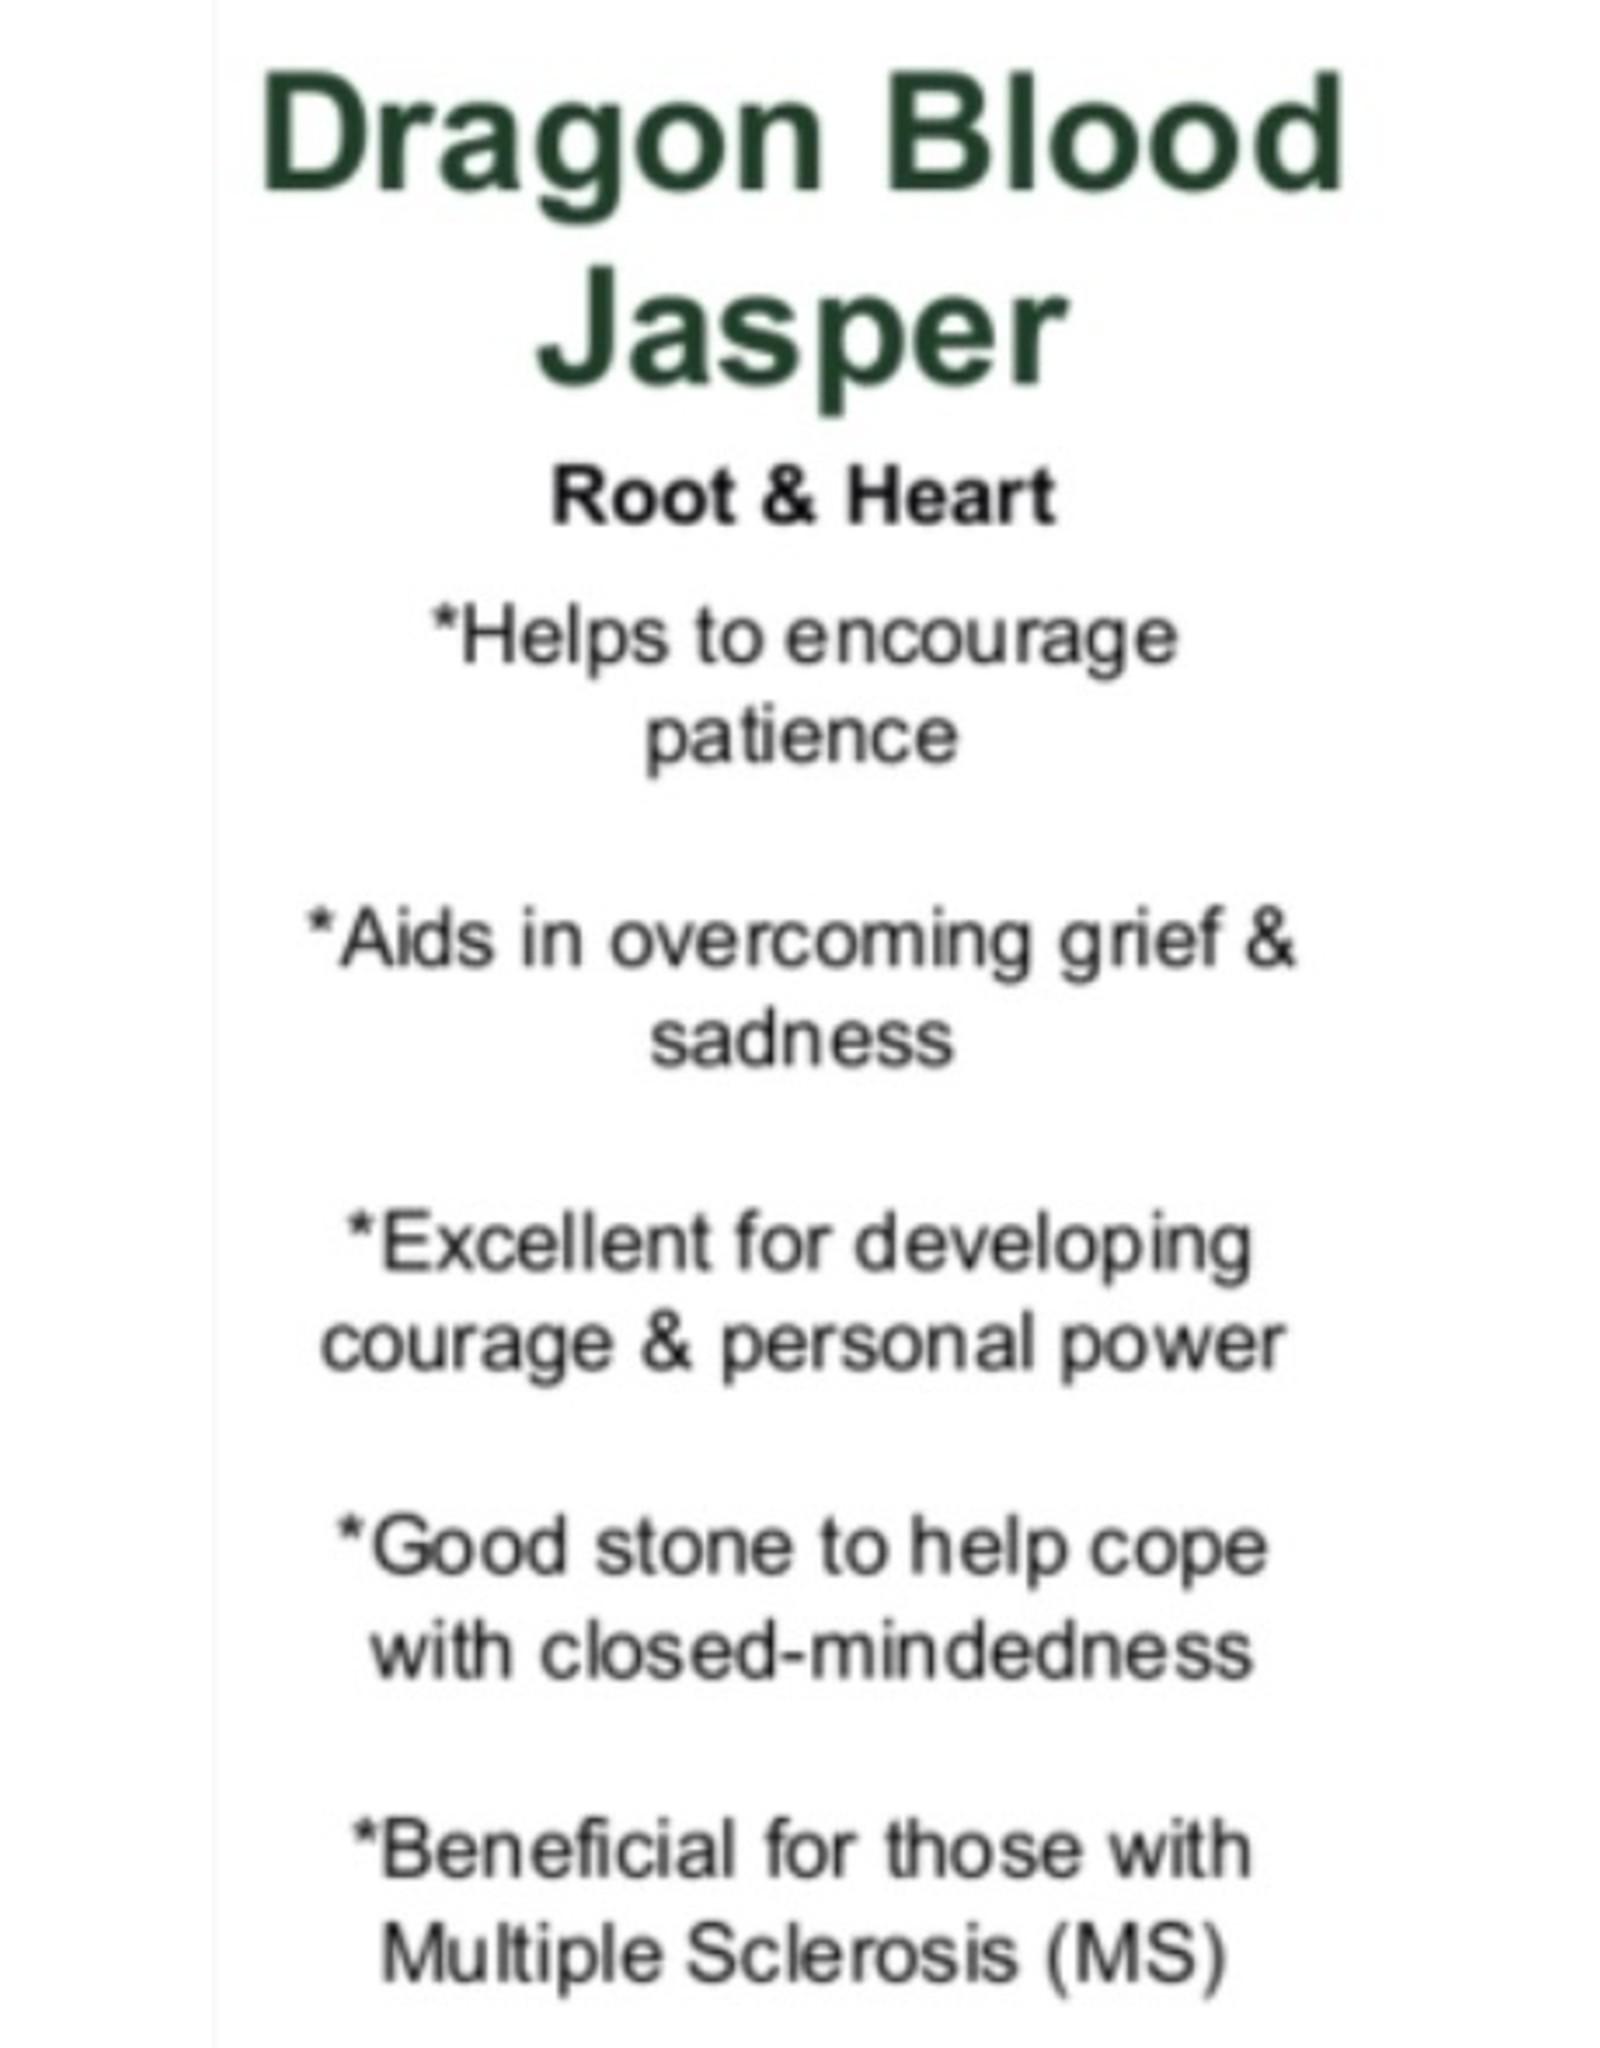 Dragons Blood Jasper Heart